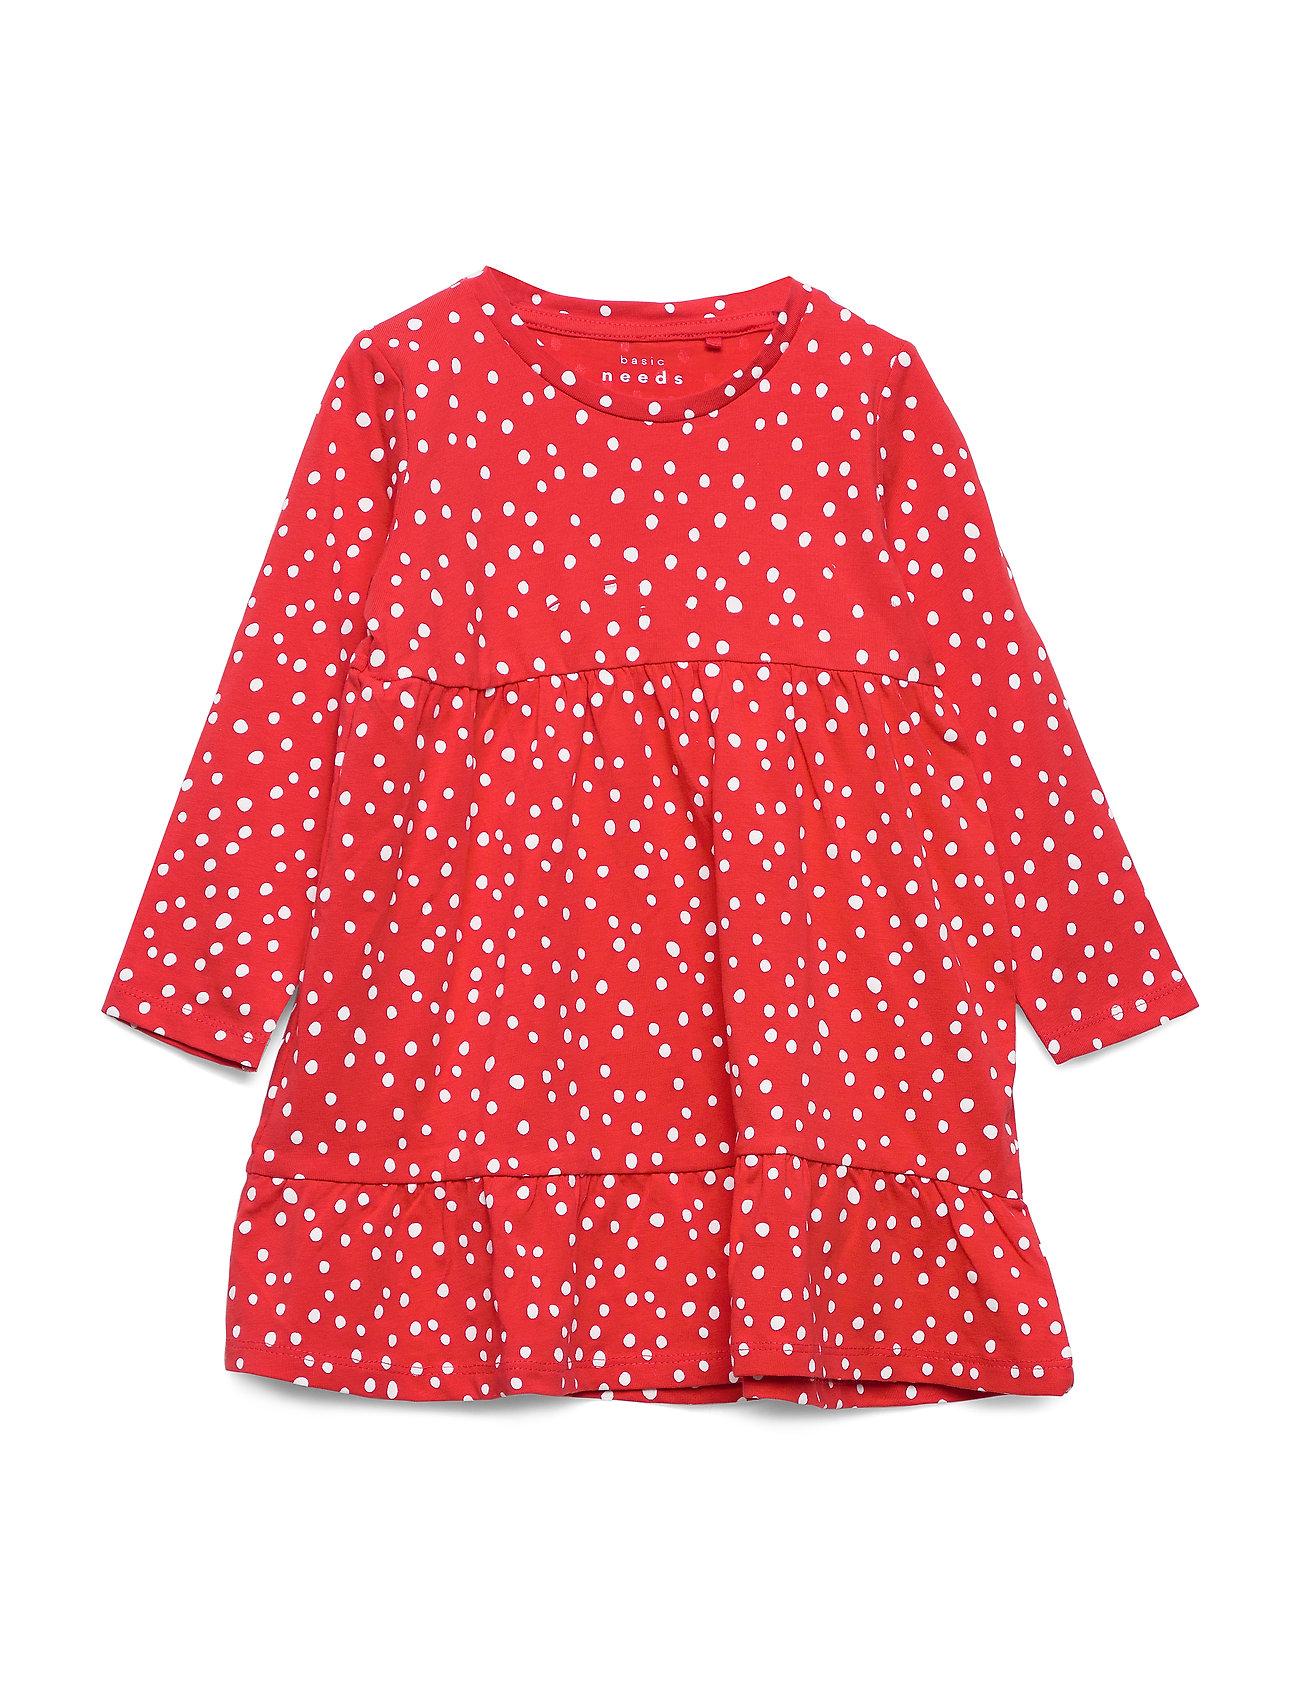 Image of Nmfvicky Ls Dress T Kjole Rød Name It (3307692429)